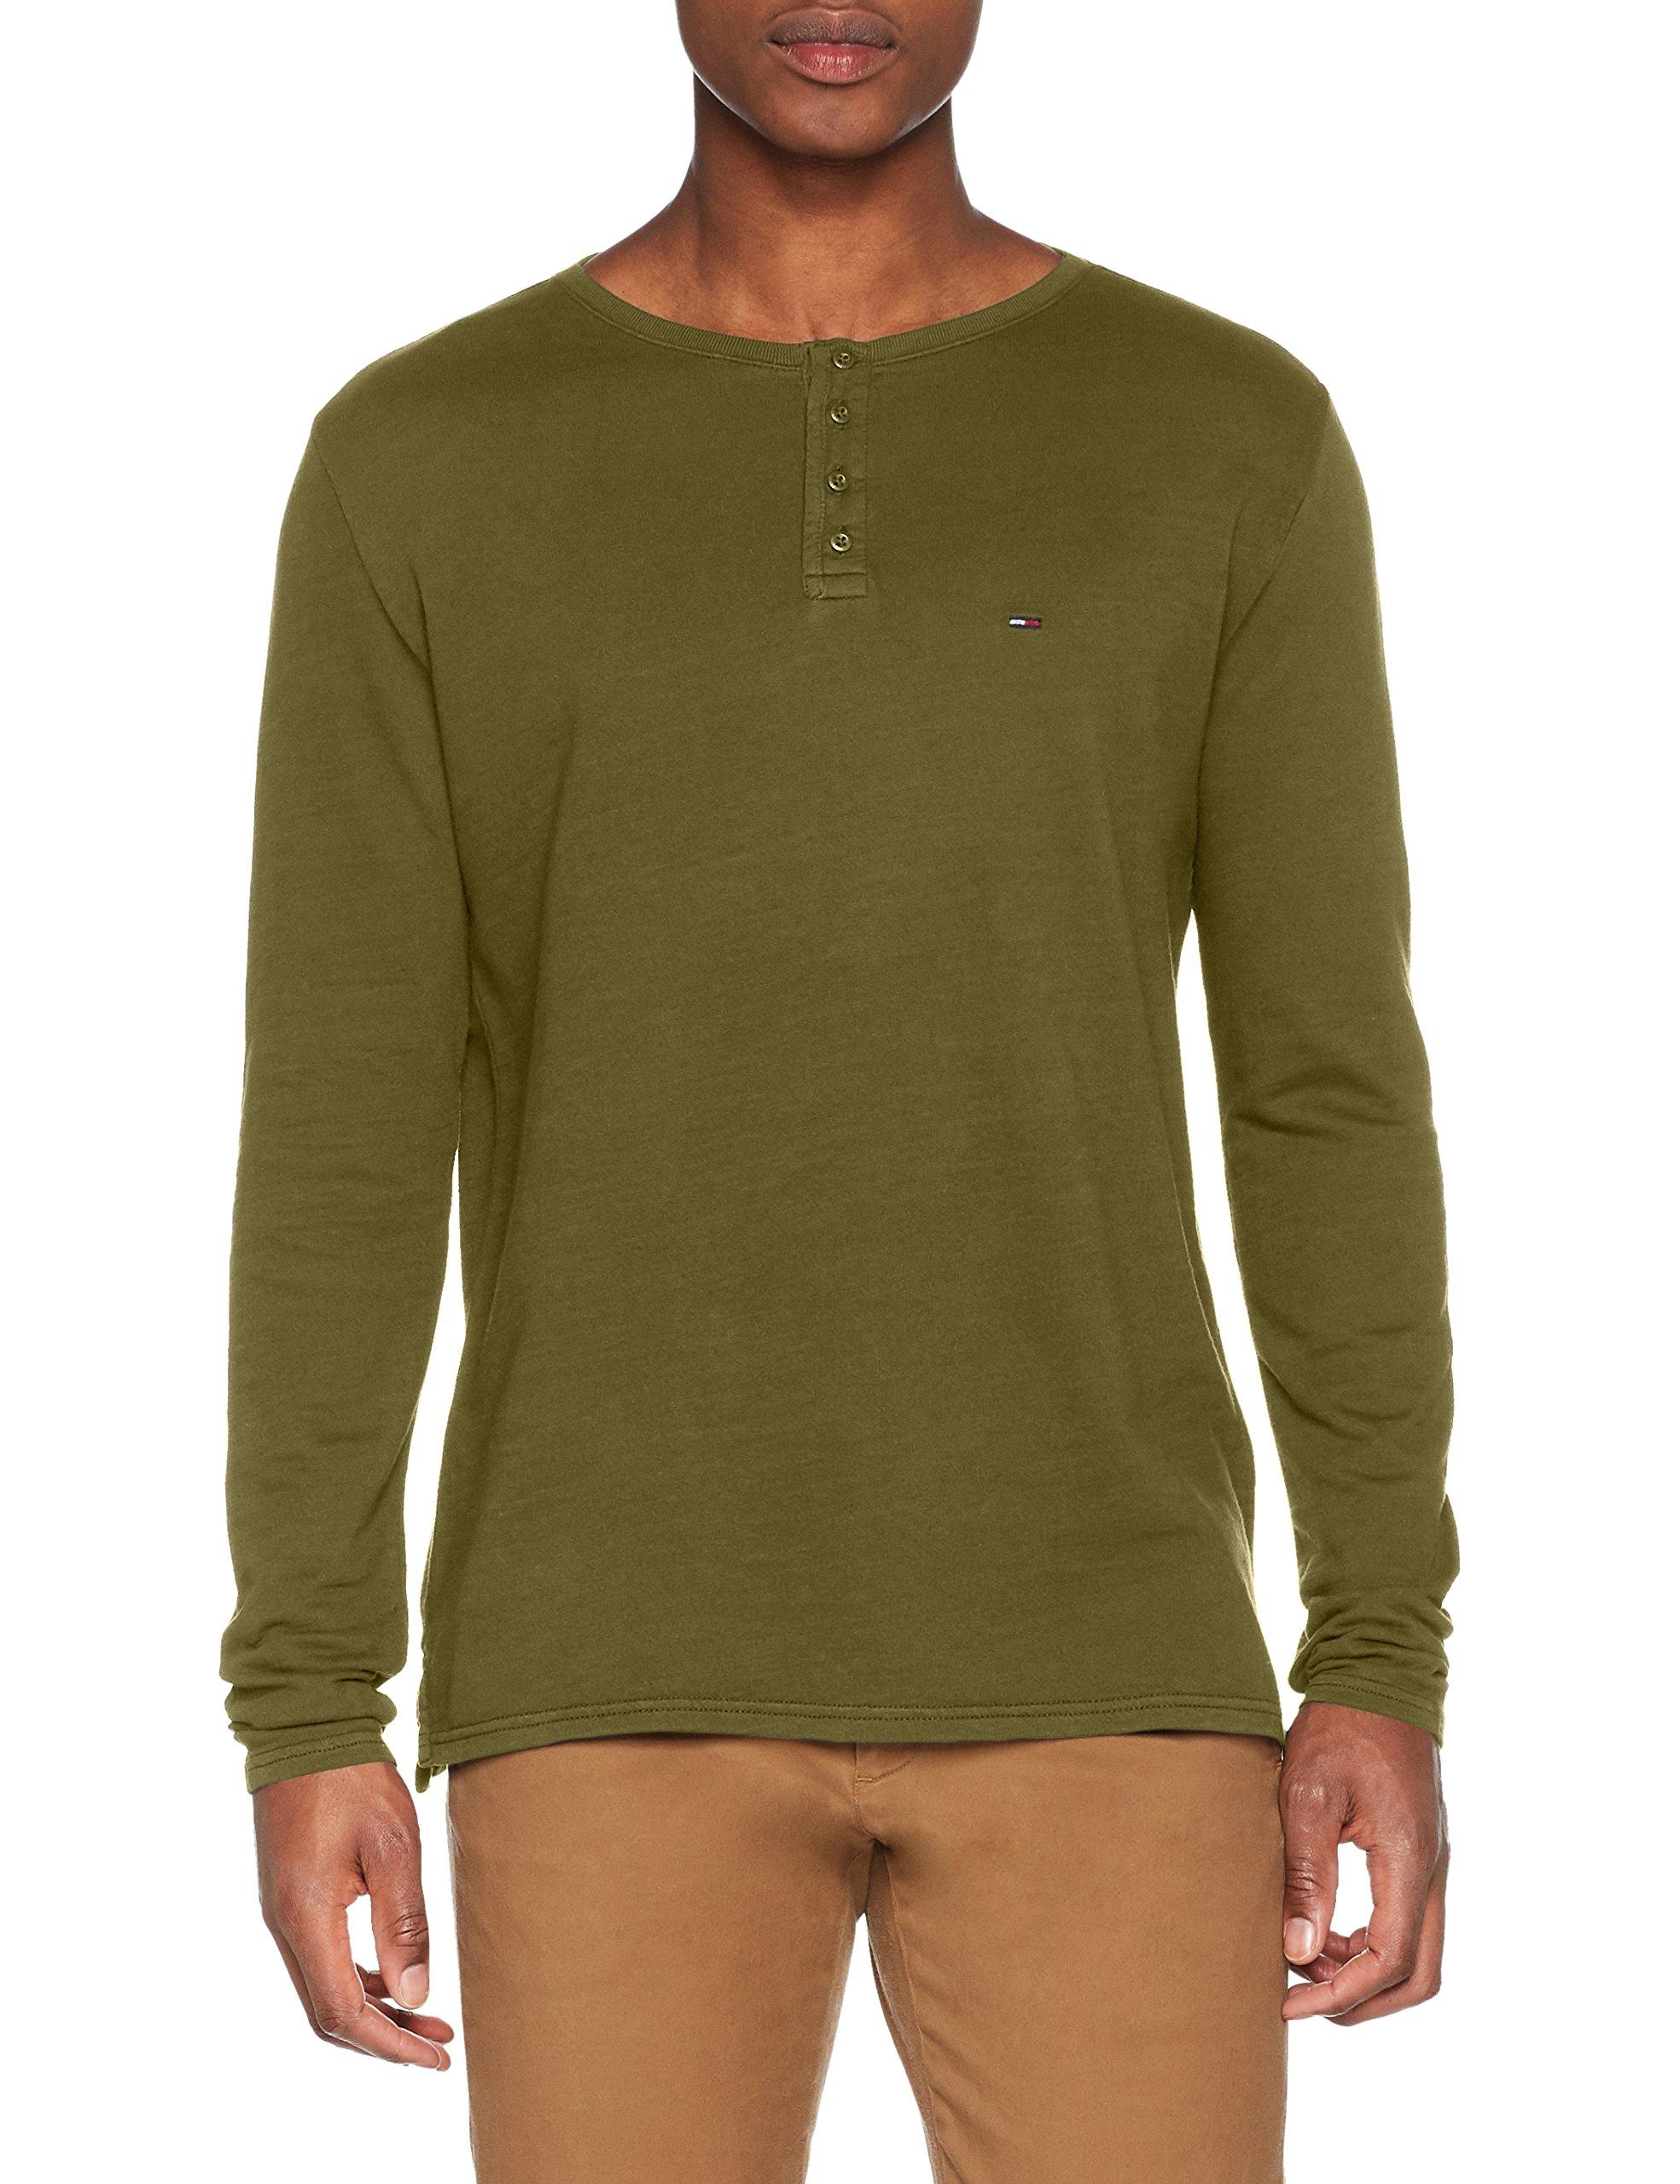 Tommy Garment Vertdeep Homme T Dye Lichen 392Small Manches Longues Jeans Henley shirt uTwZiPkXO